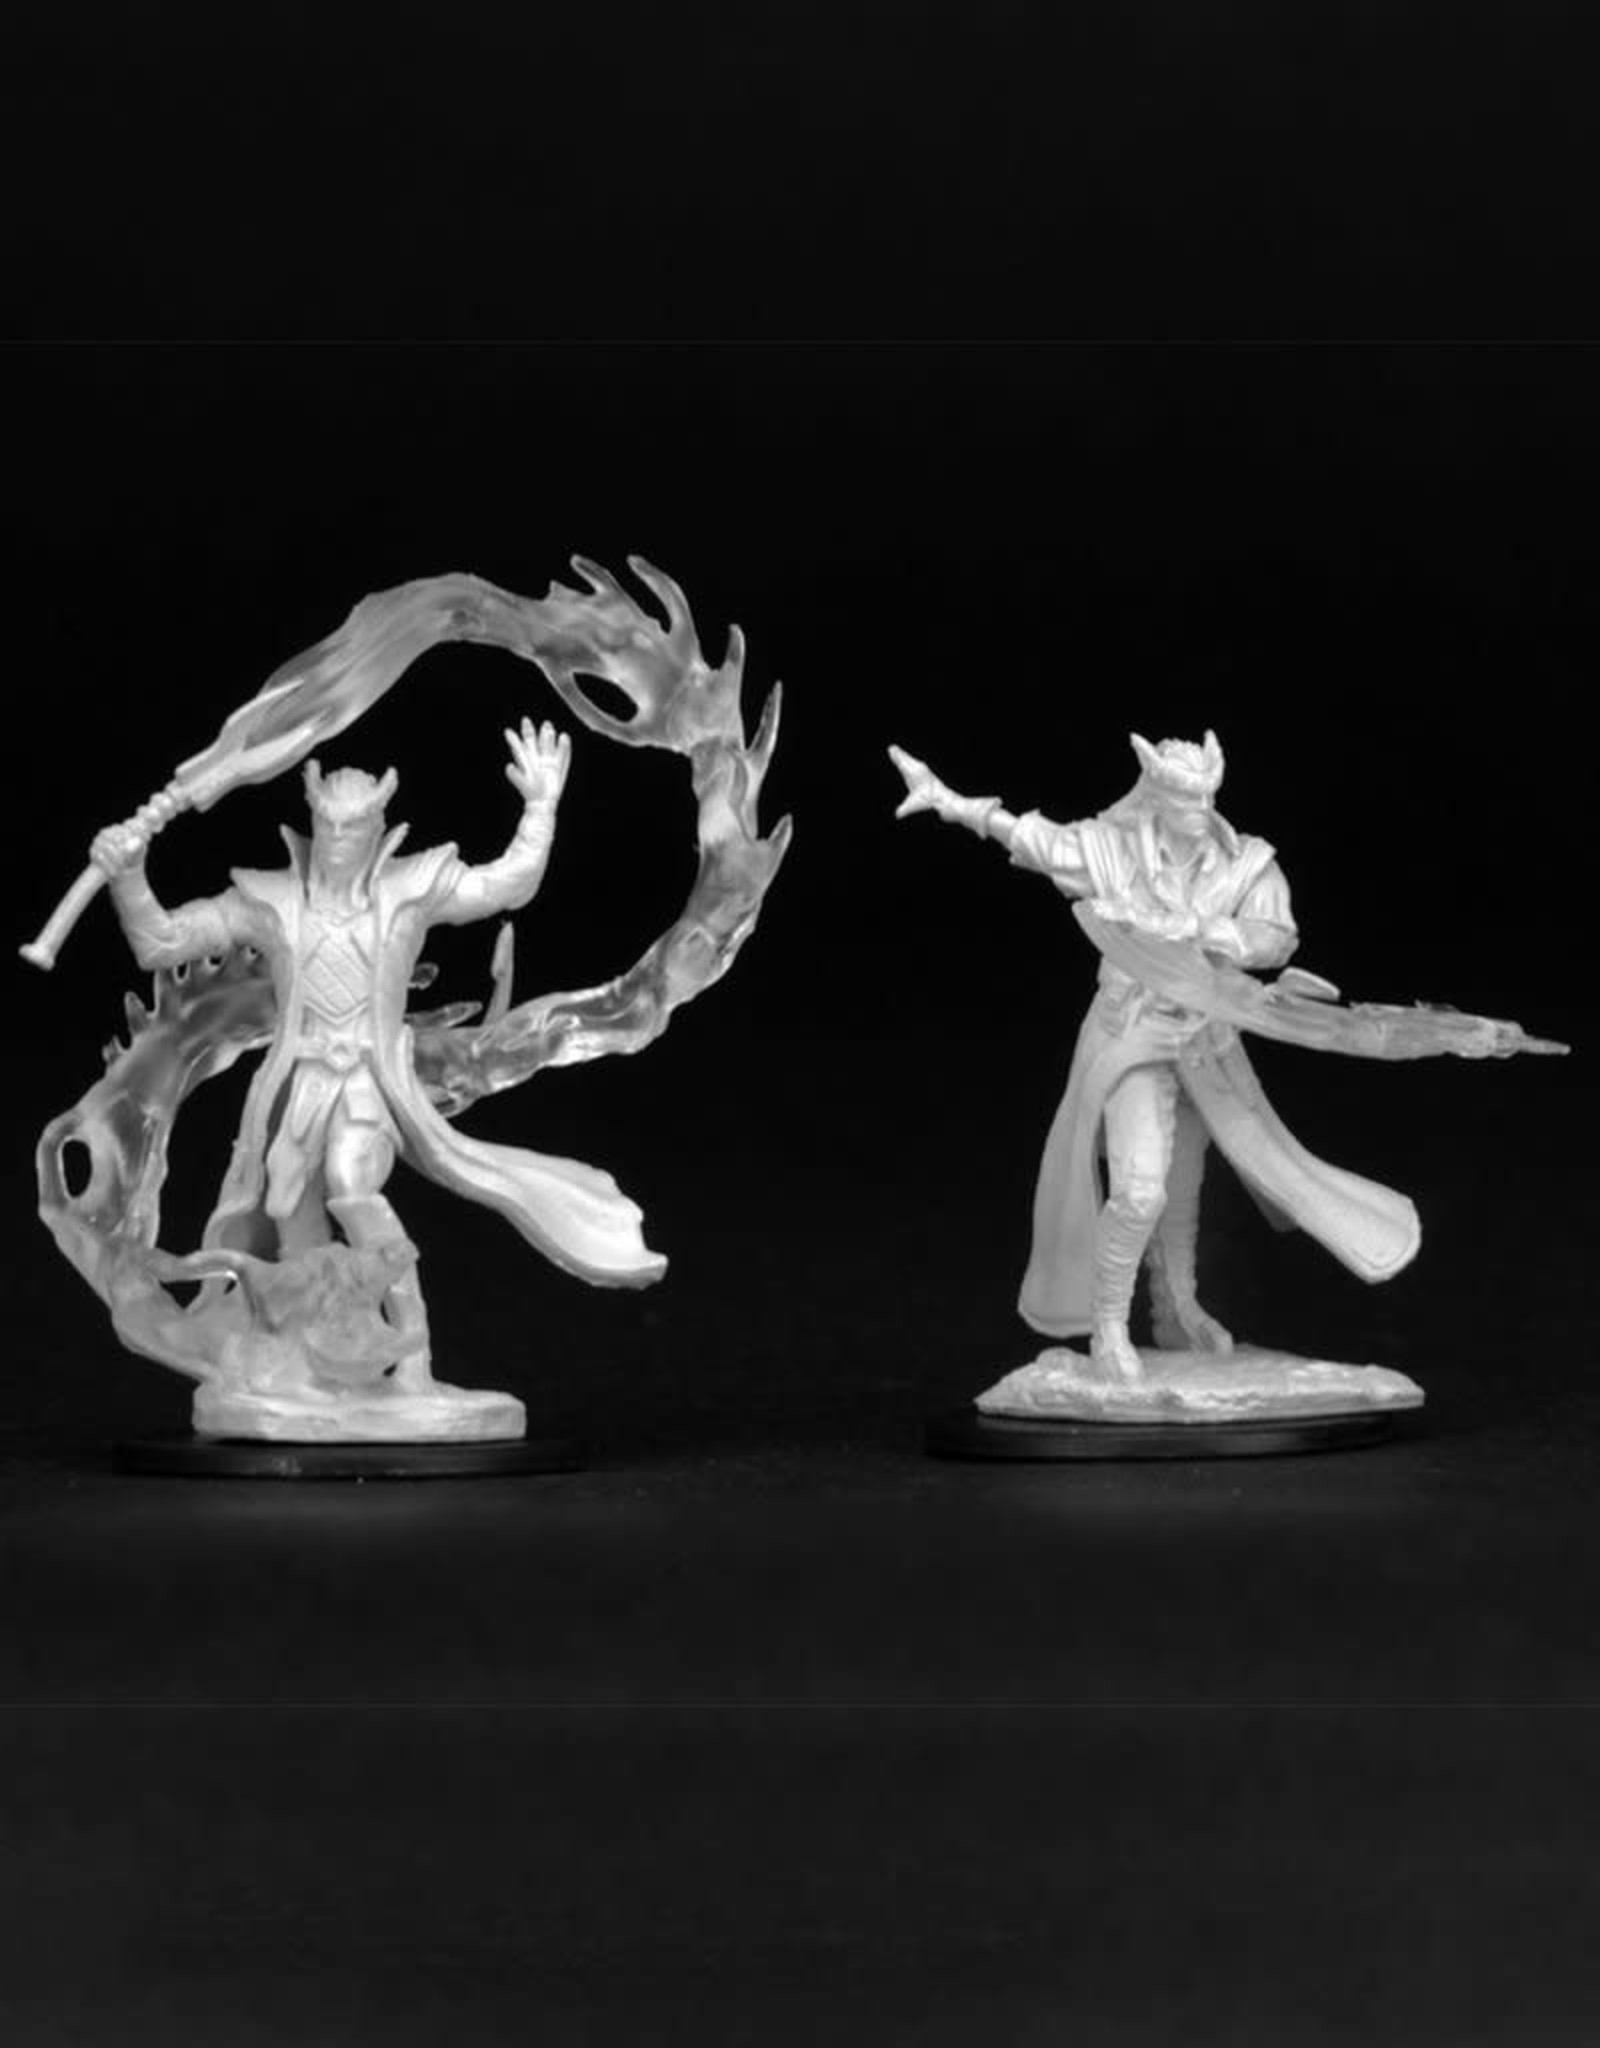 Wizkids D&D Unpainted Minis: Tiefling Sorcerer Male